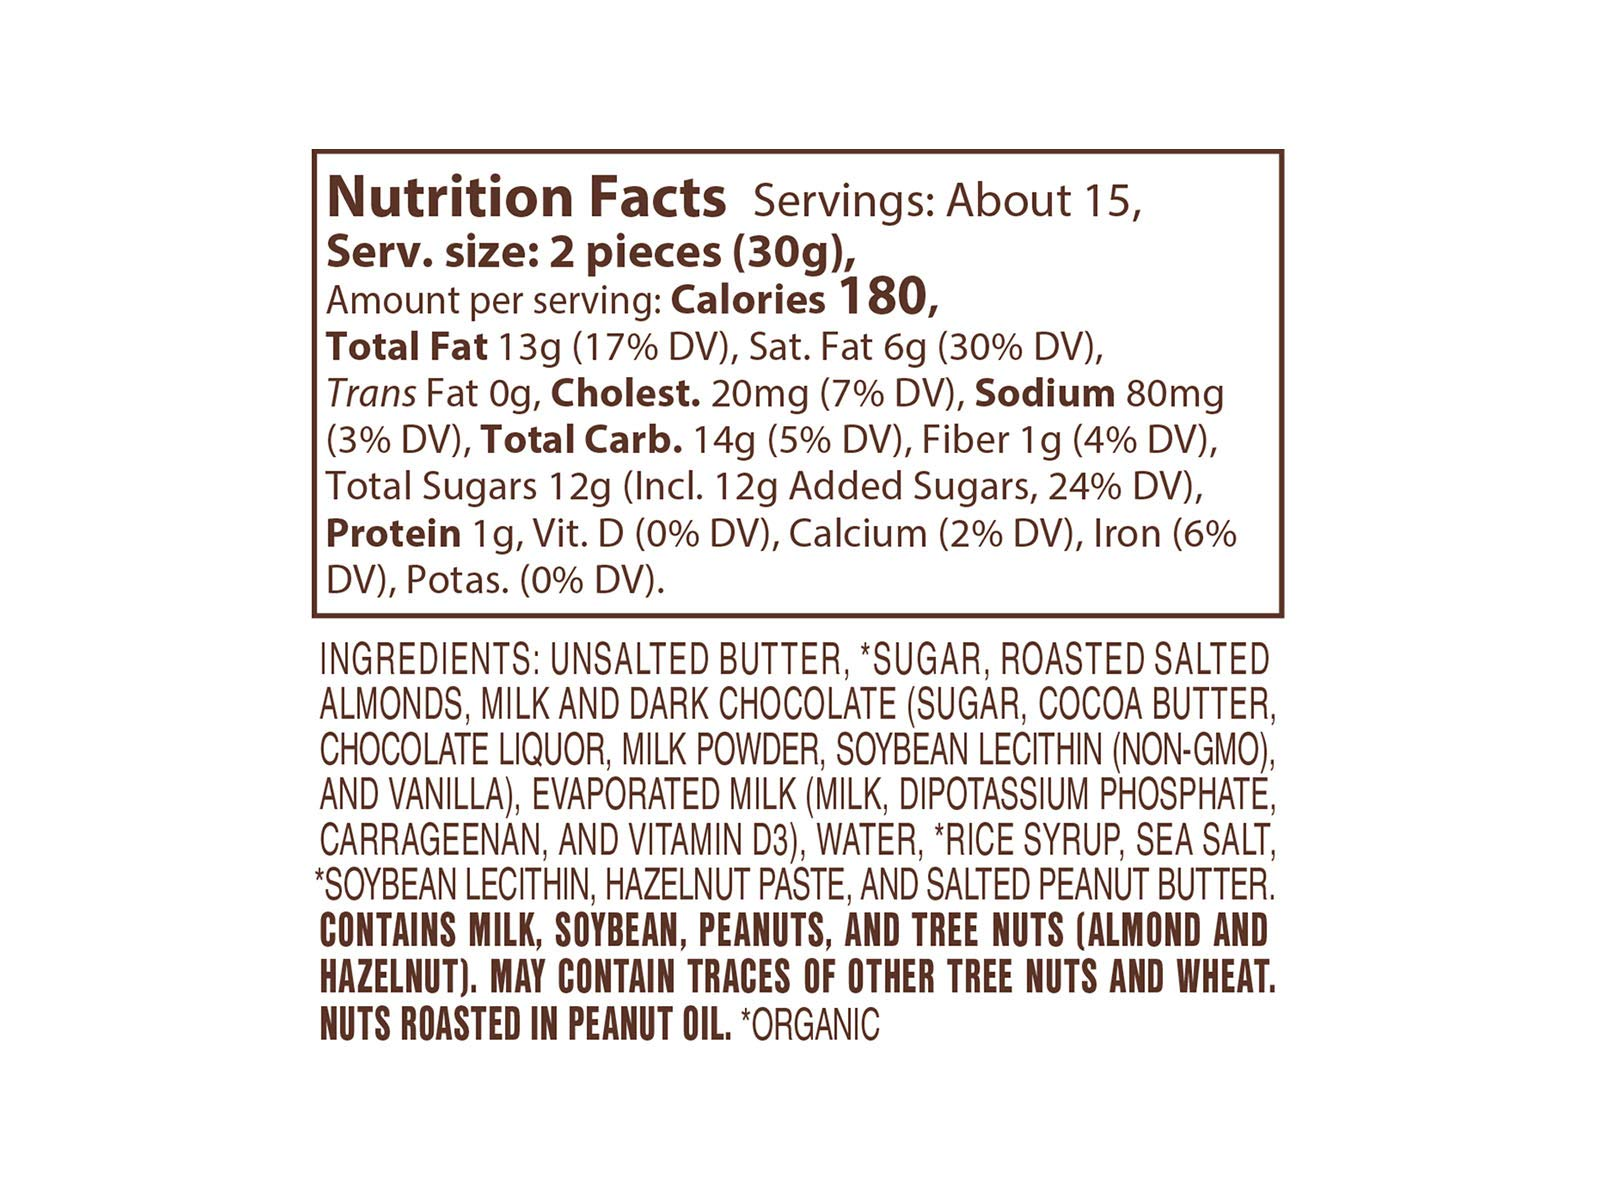 Lake Champlain Chocolates Almond Butter Crunch (English Toffee), 1 Pound by Lake Champlain Chocolates